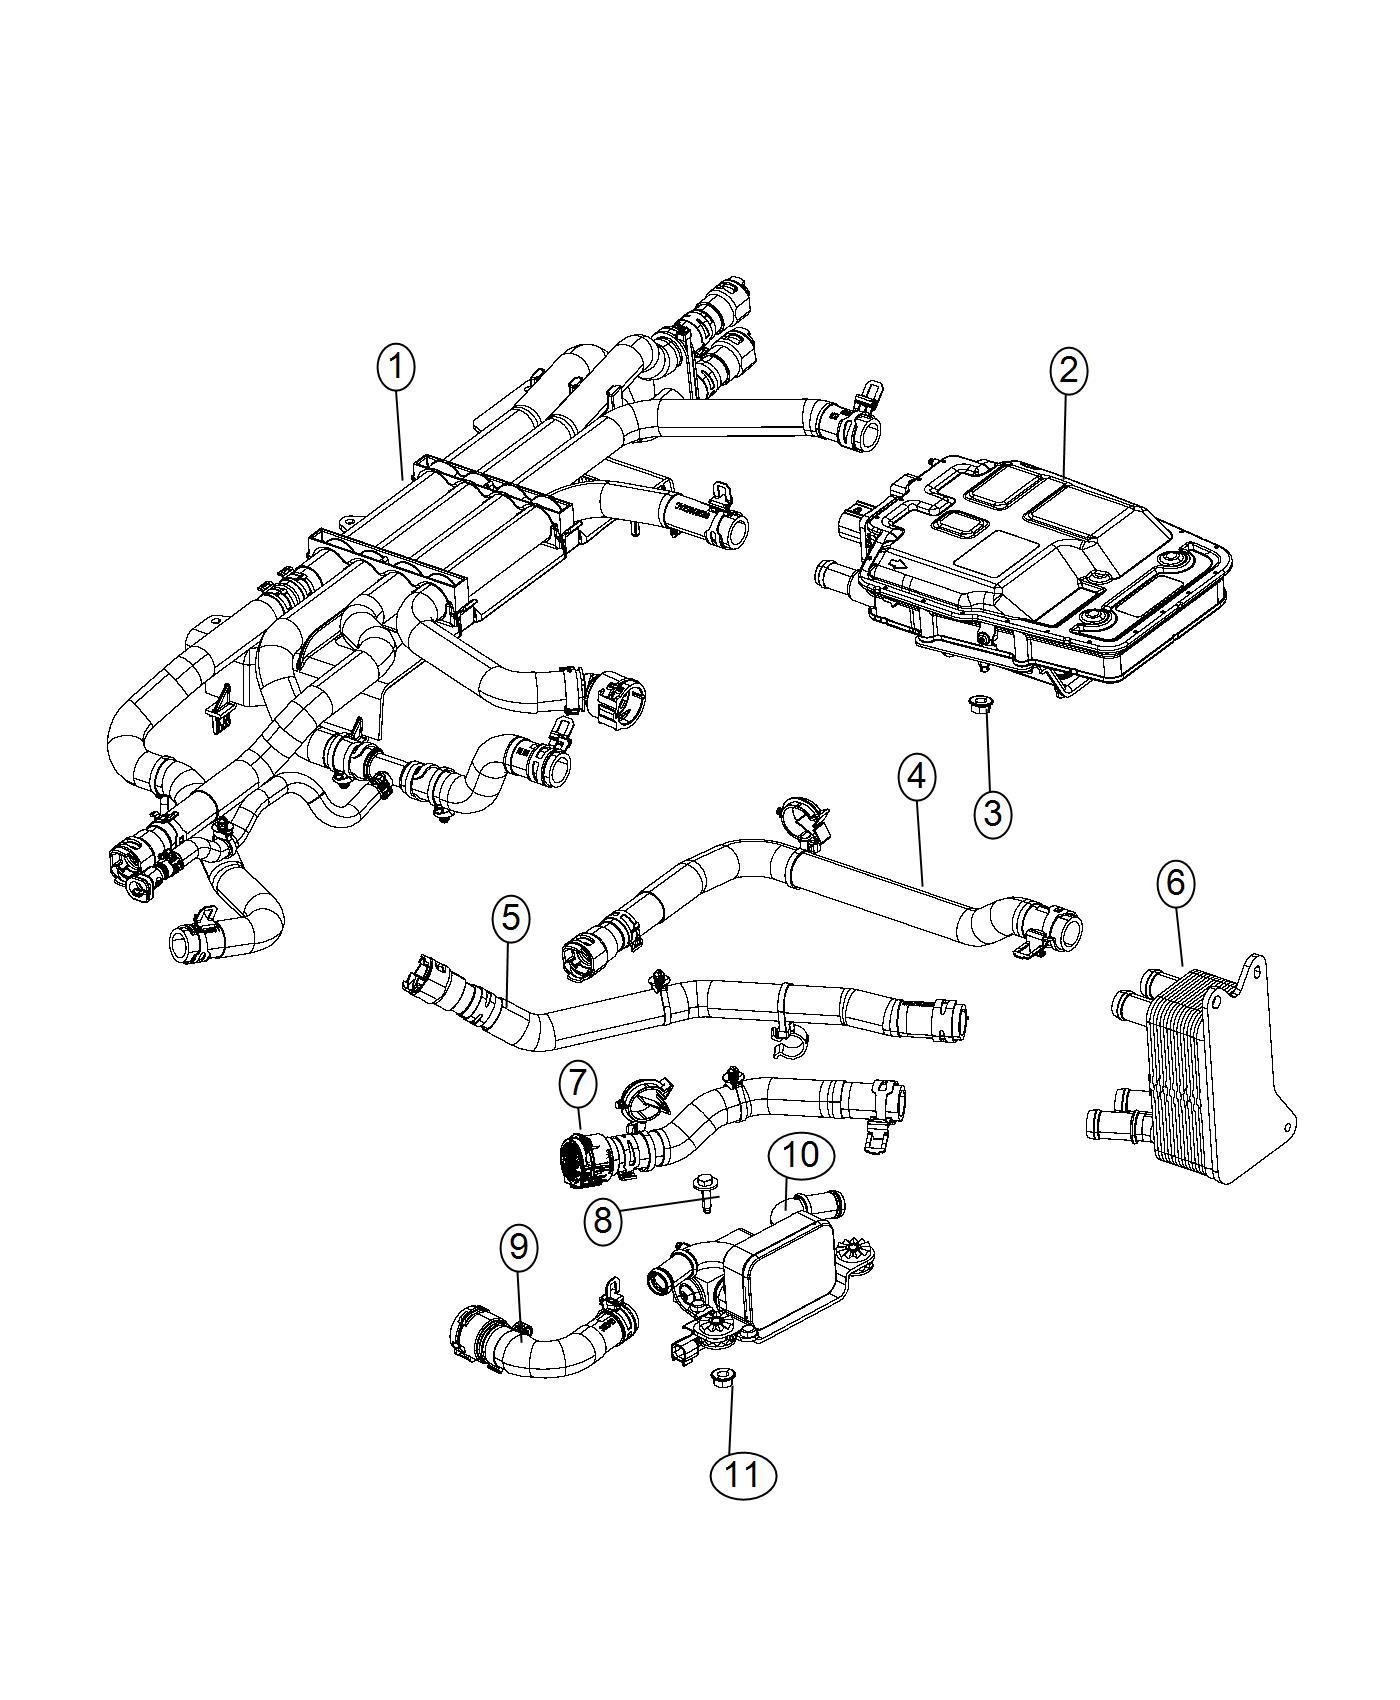 Chrysler Pacifica Heat Exchanger Chiller Battery Cooling